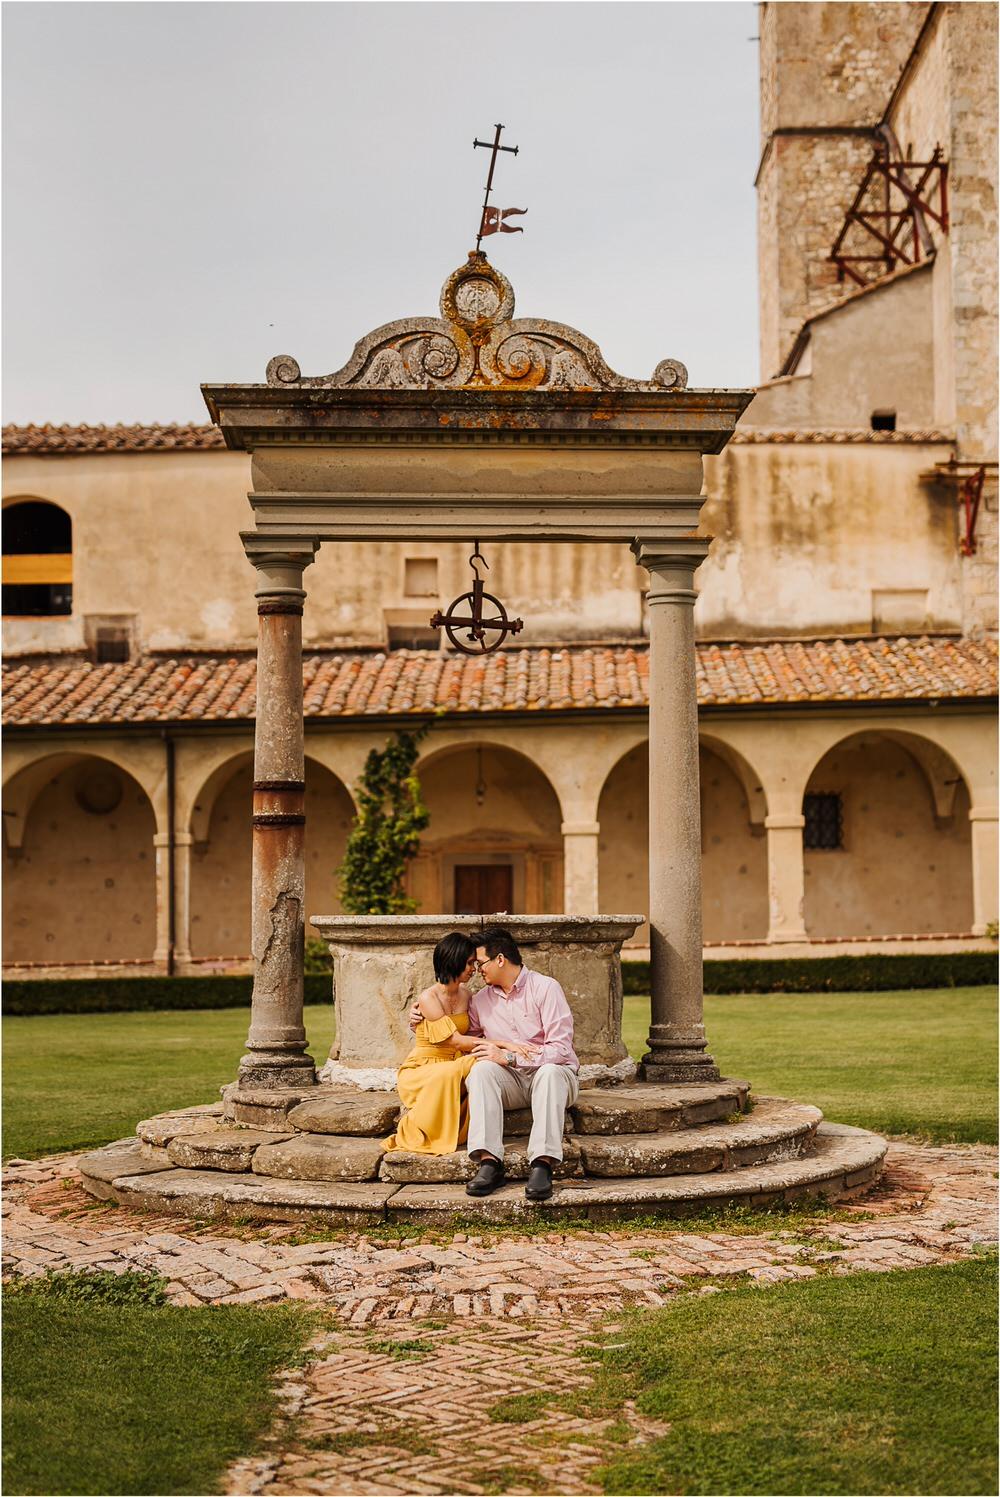 tuscany siena wedding anniversary honeymoon photography photographer italy matrimonio destination val d'orcia toscana 0027.jpg